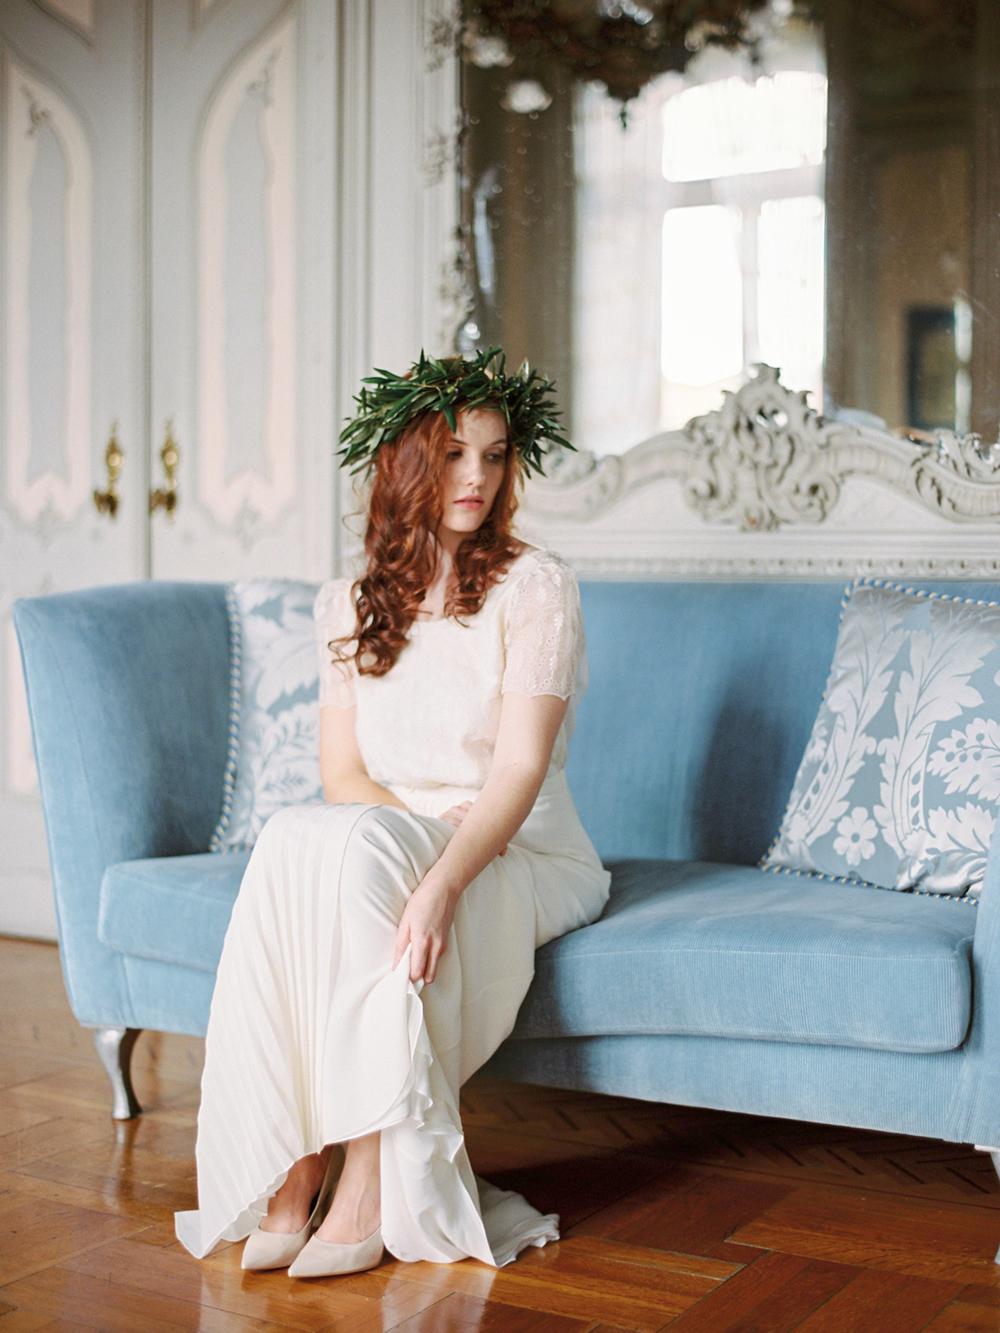 algarve_wedding_photography_winter_blues_16.jpg